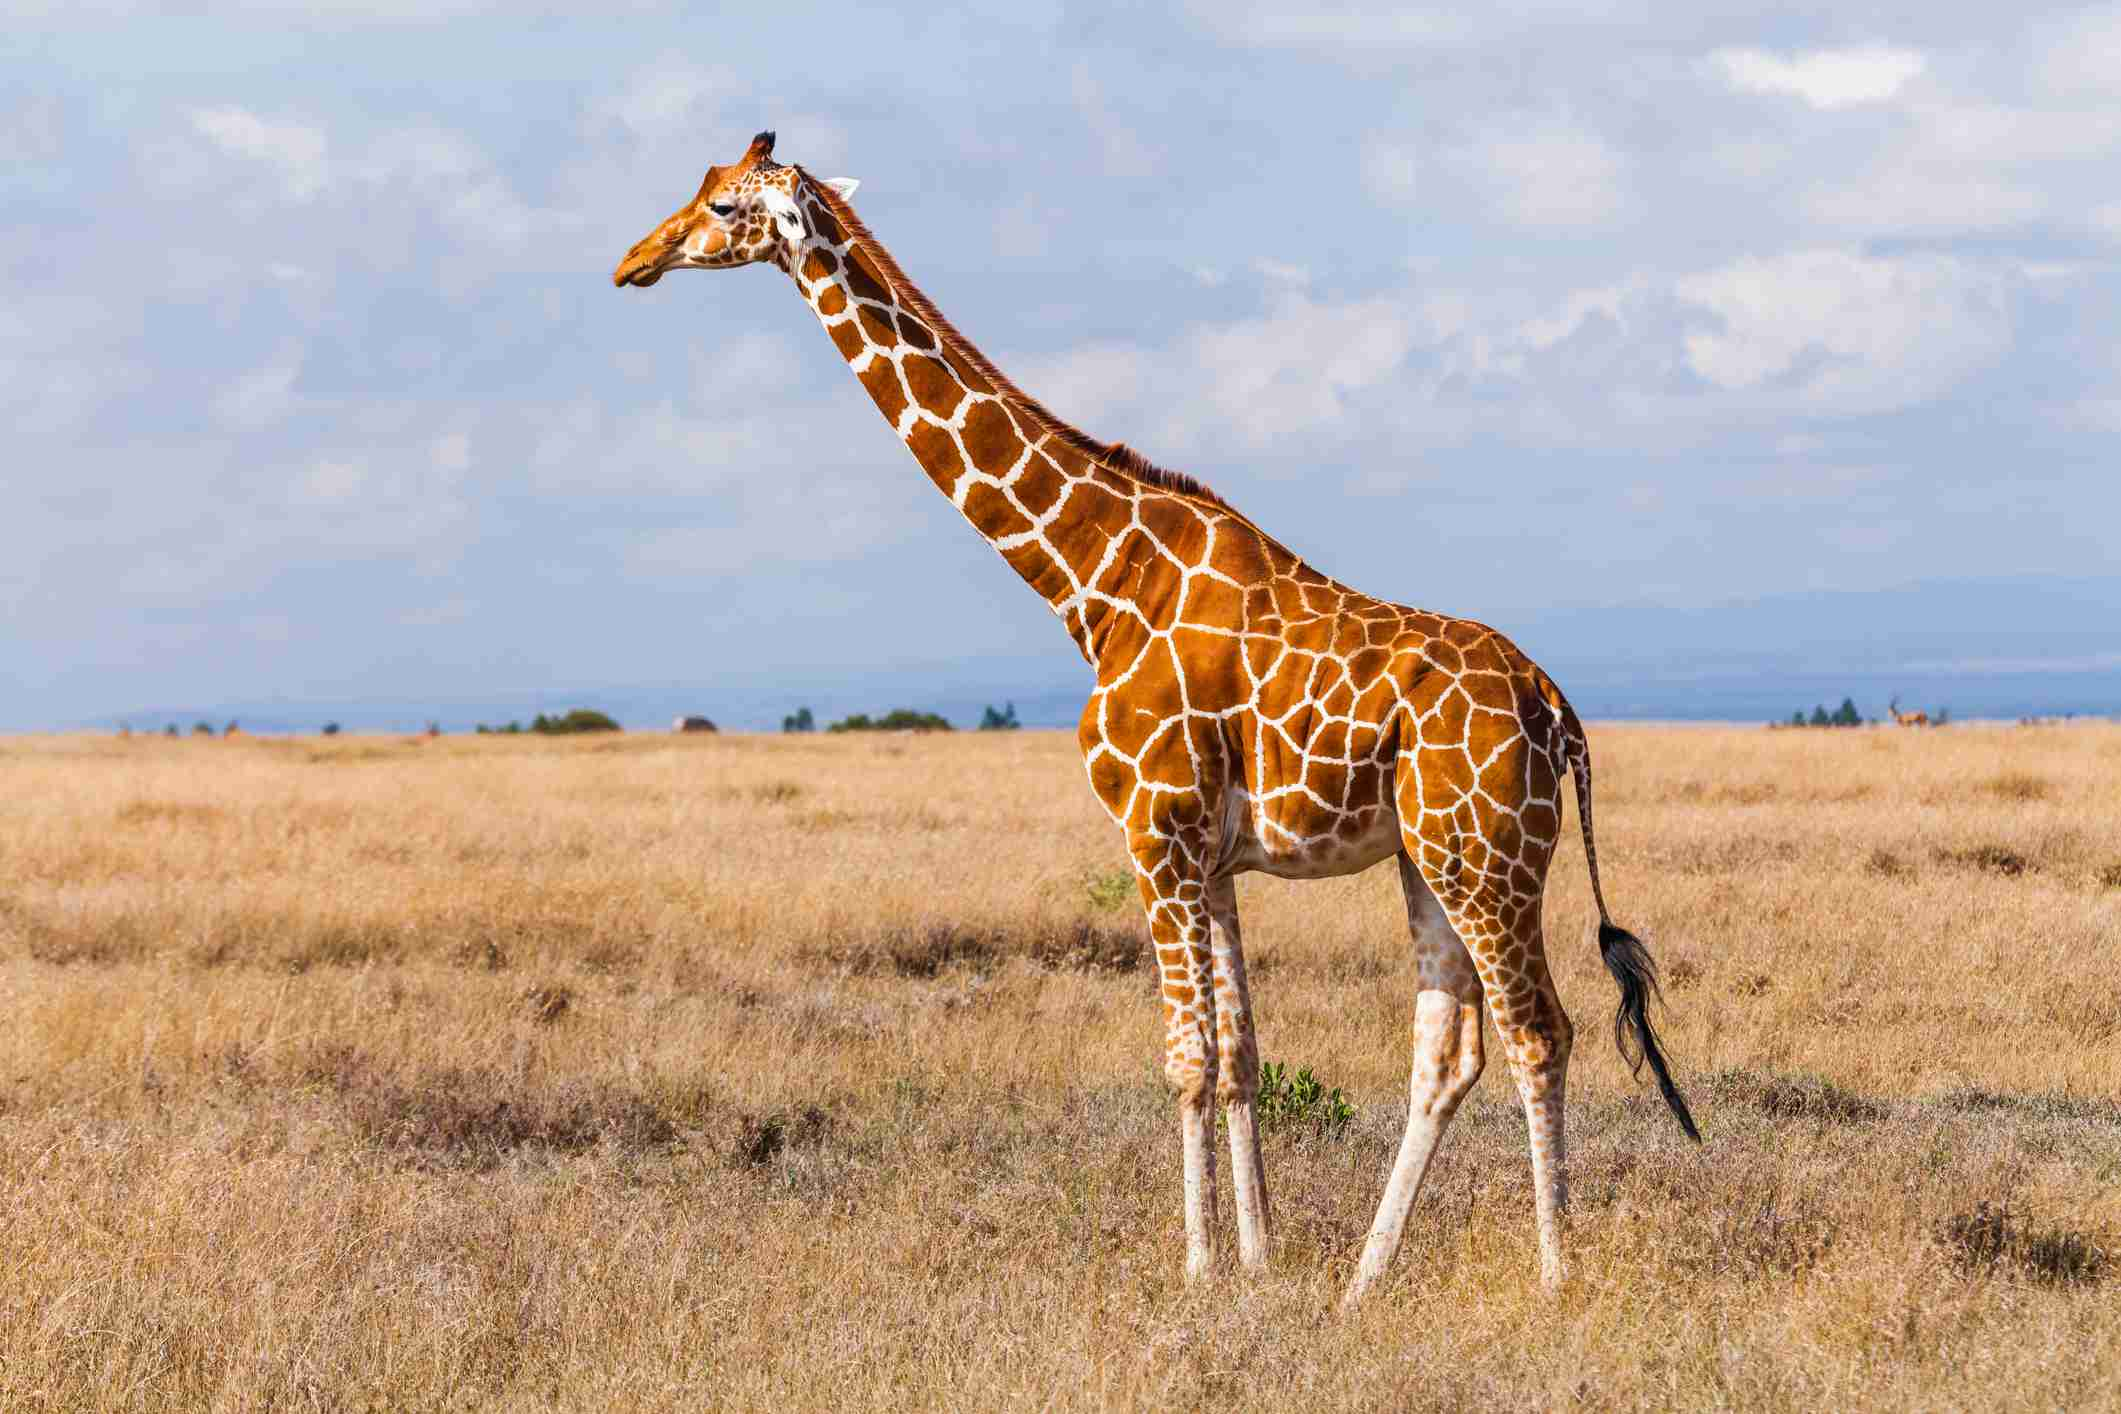 photo of giraffe in the savana